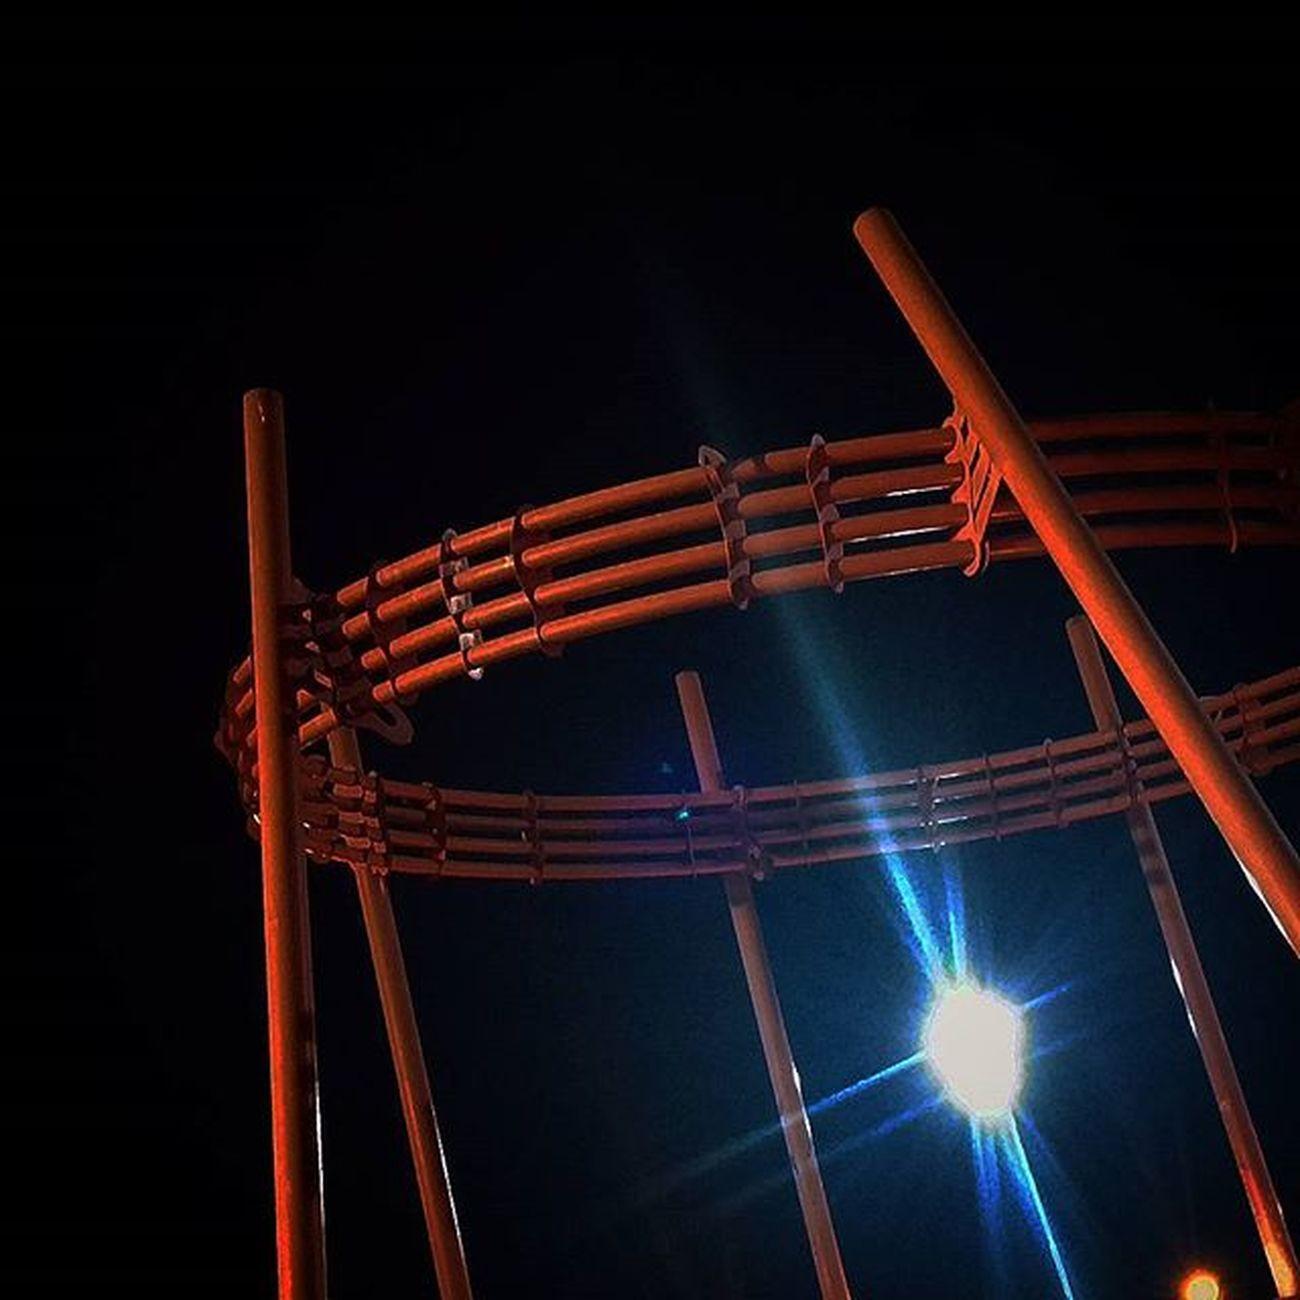 The Milstein Memorial Argentina Bsas Buenosaires Bahiablanca Architecture Arquitectura ArchiTexture Urban City Nobelprize Medicine Memorial Monument GutenNacht Bonnenuit Buenasnoches Igrs IgrsArgentina IgrsBsAs Instagram Igersargentina Igersbsas